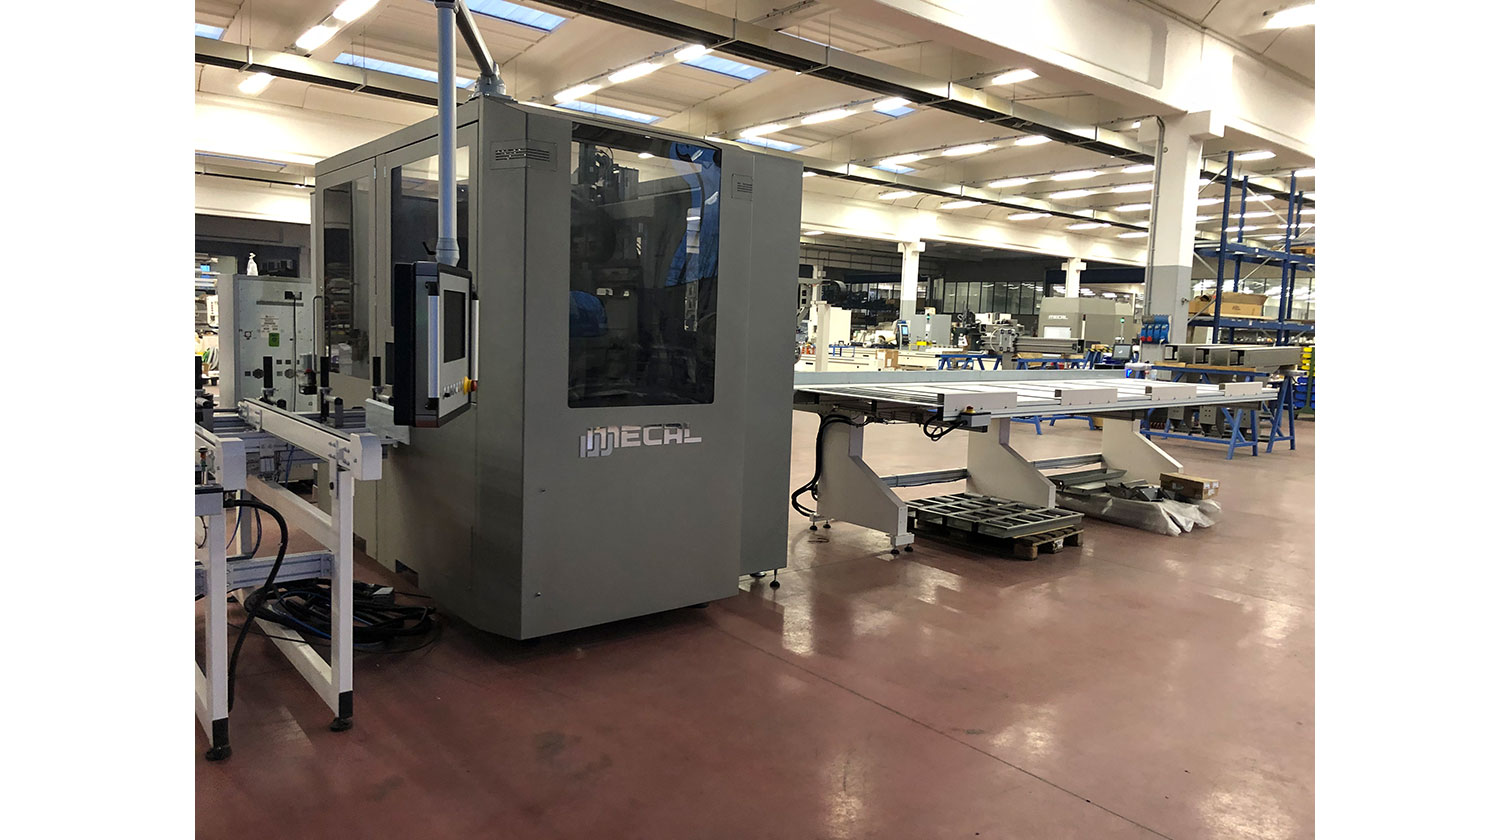 INT aluminum CNC Mecal MC 316 fabrication centre close look i 1